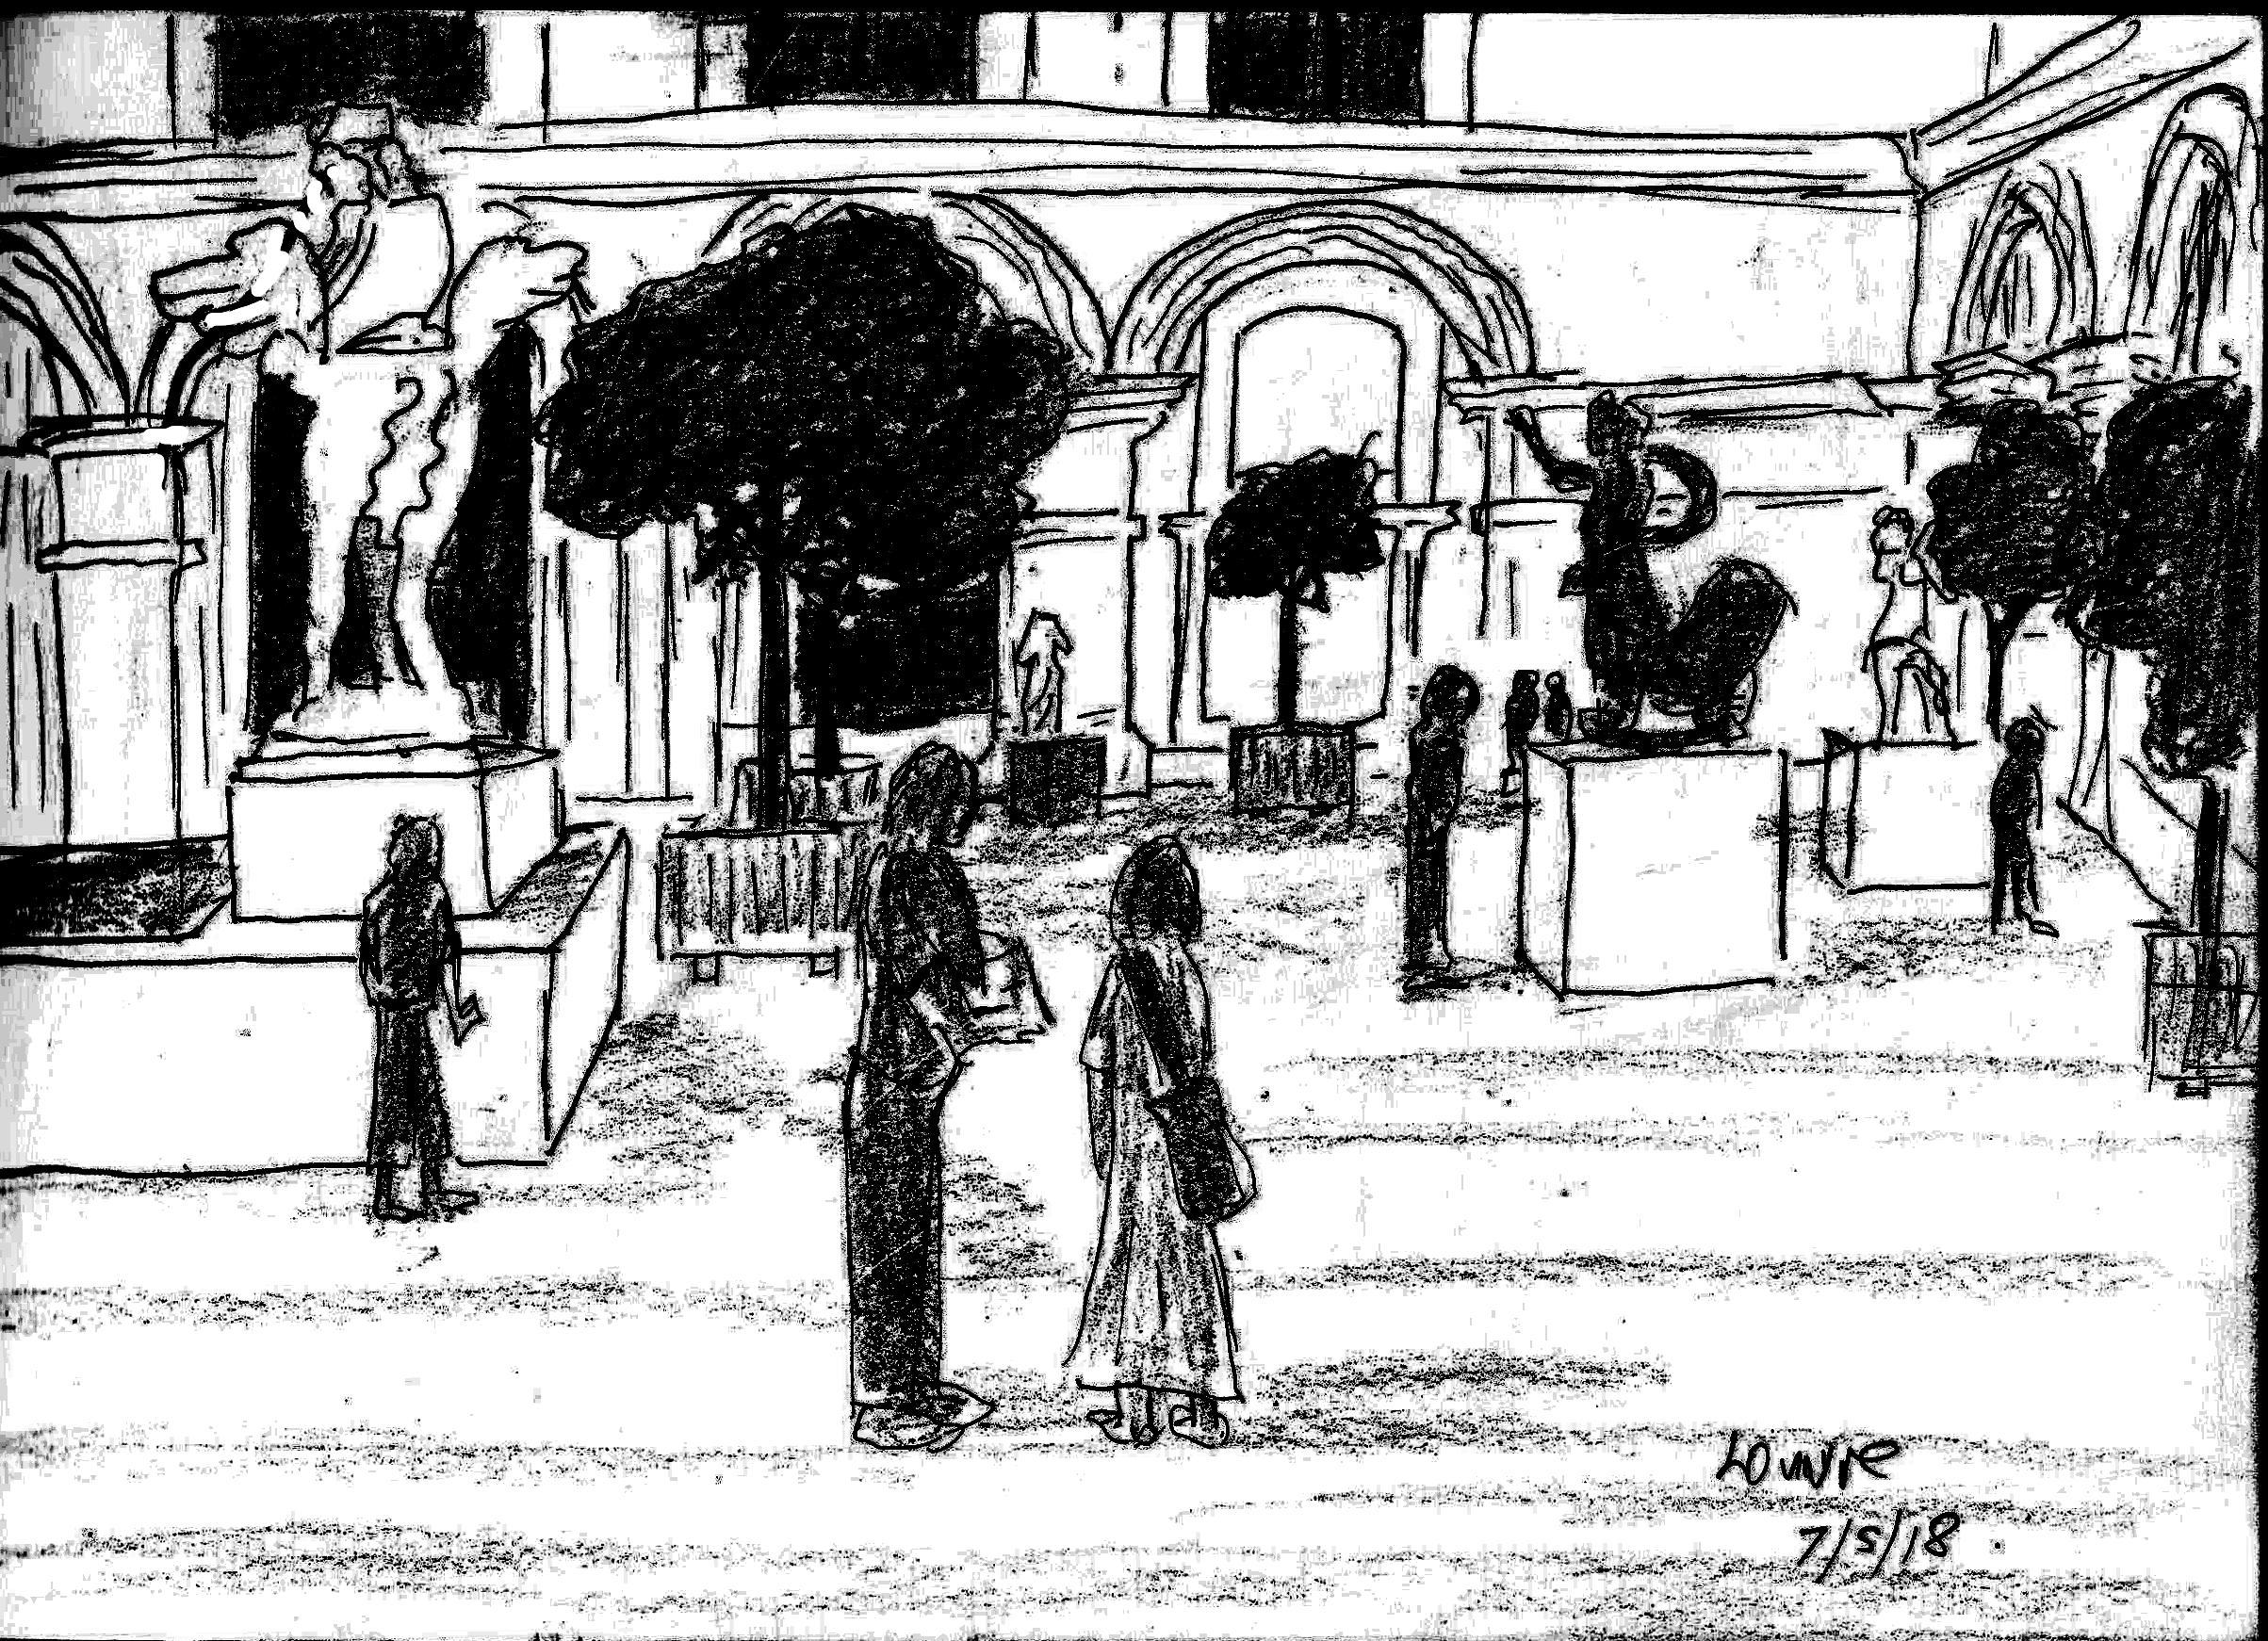 louvre sketch dark